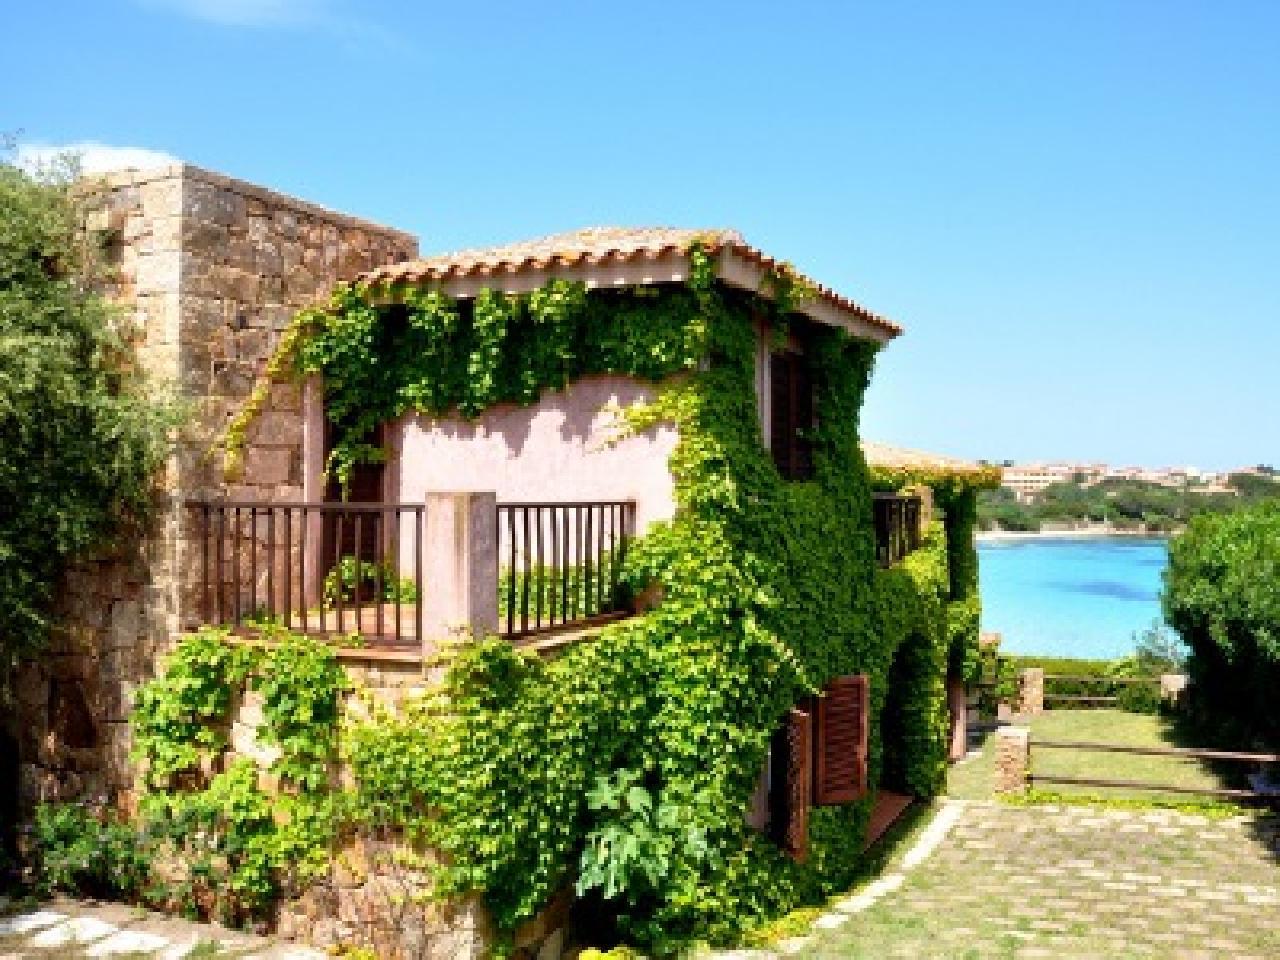 Appartamenti luddastru golfo aranci sardinia italy for Appartamenti sardegna